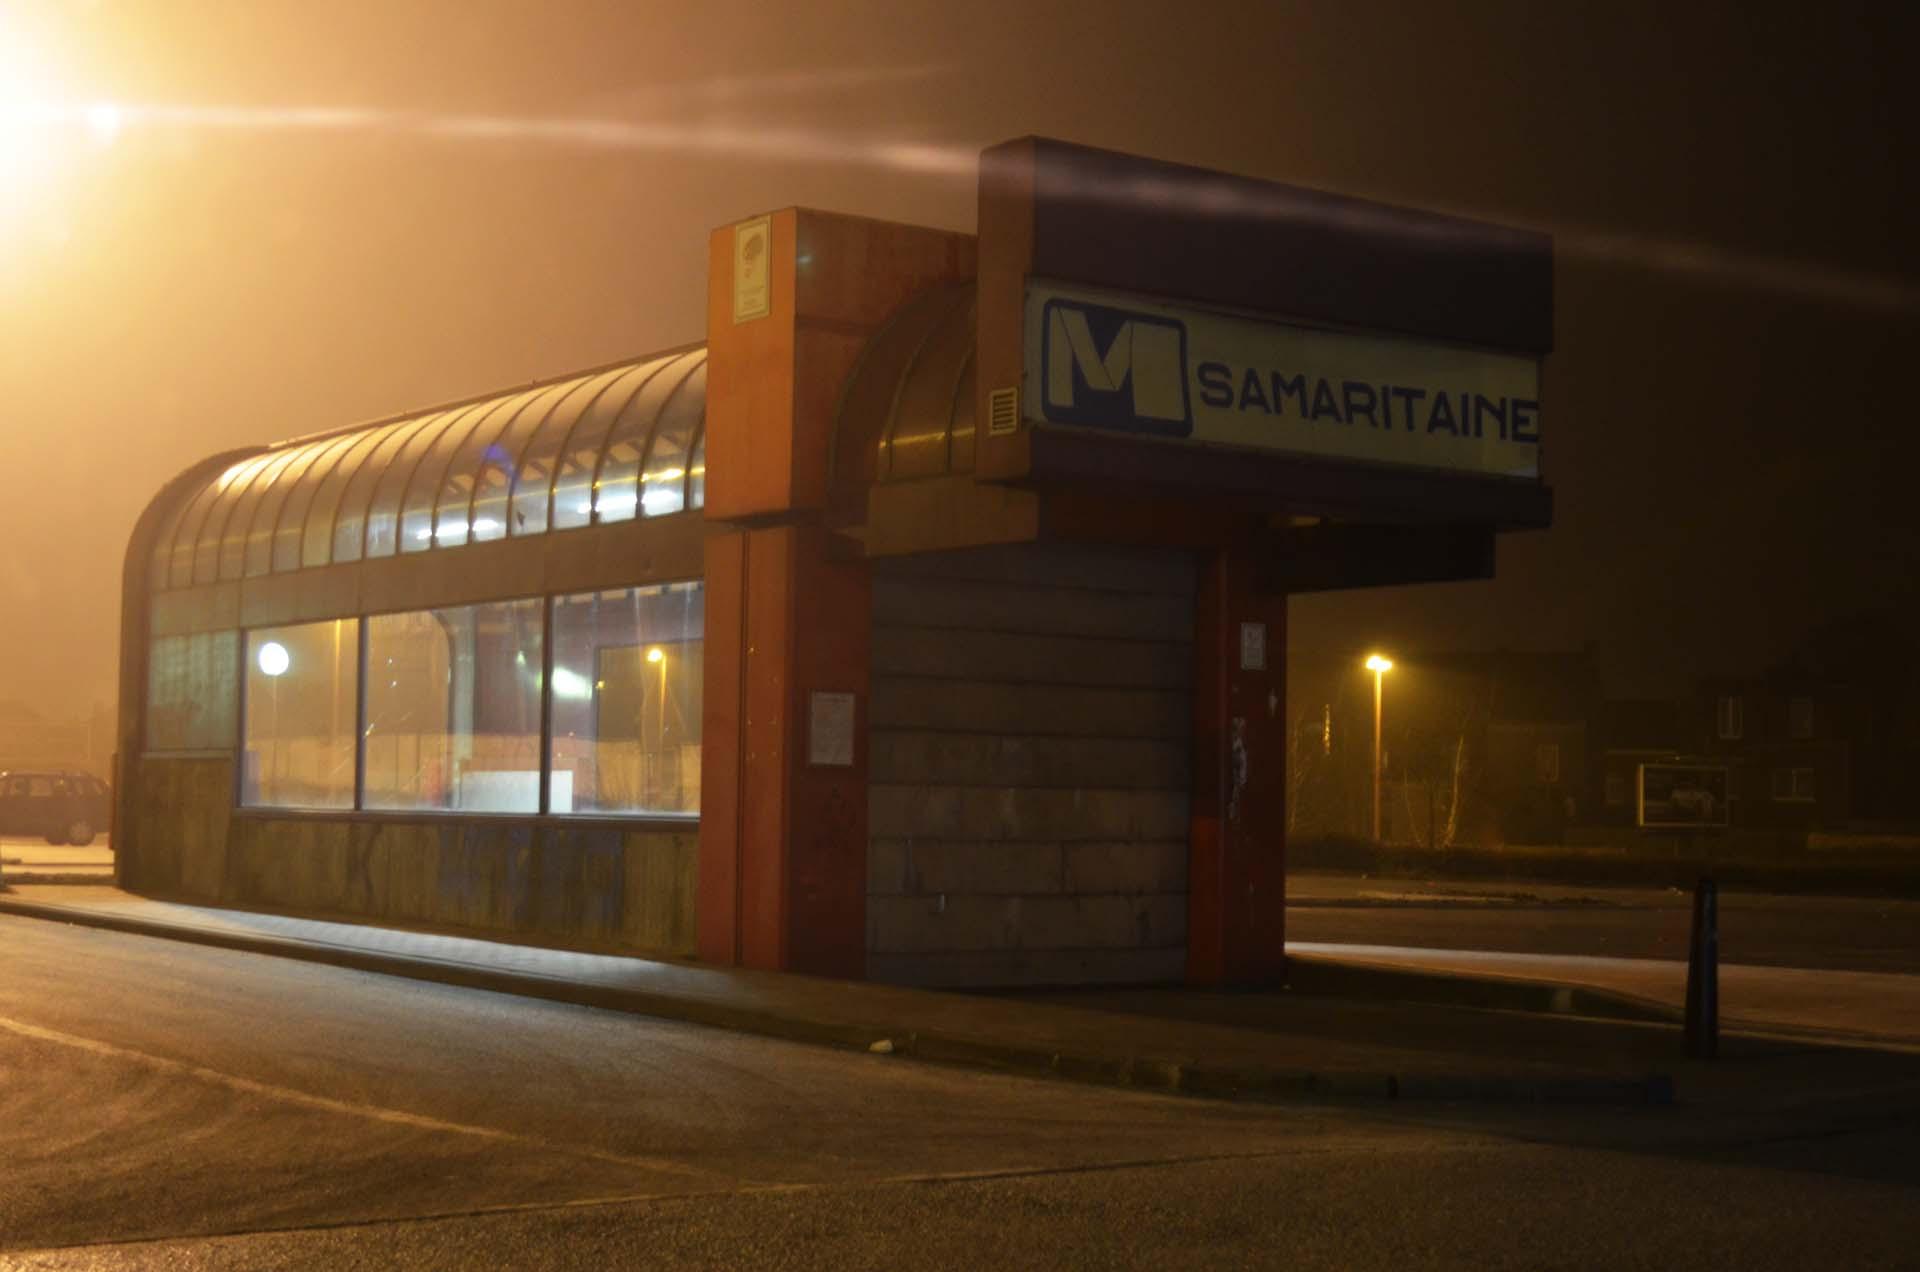 Metro Station, Charleroi